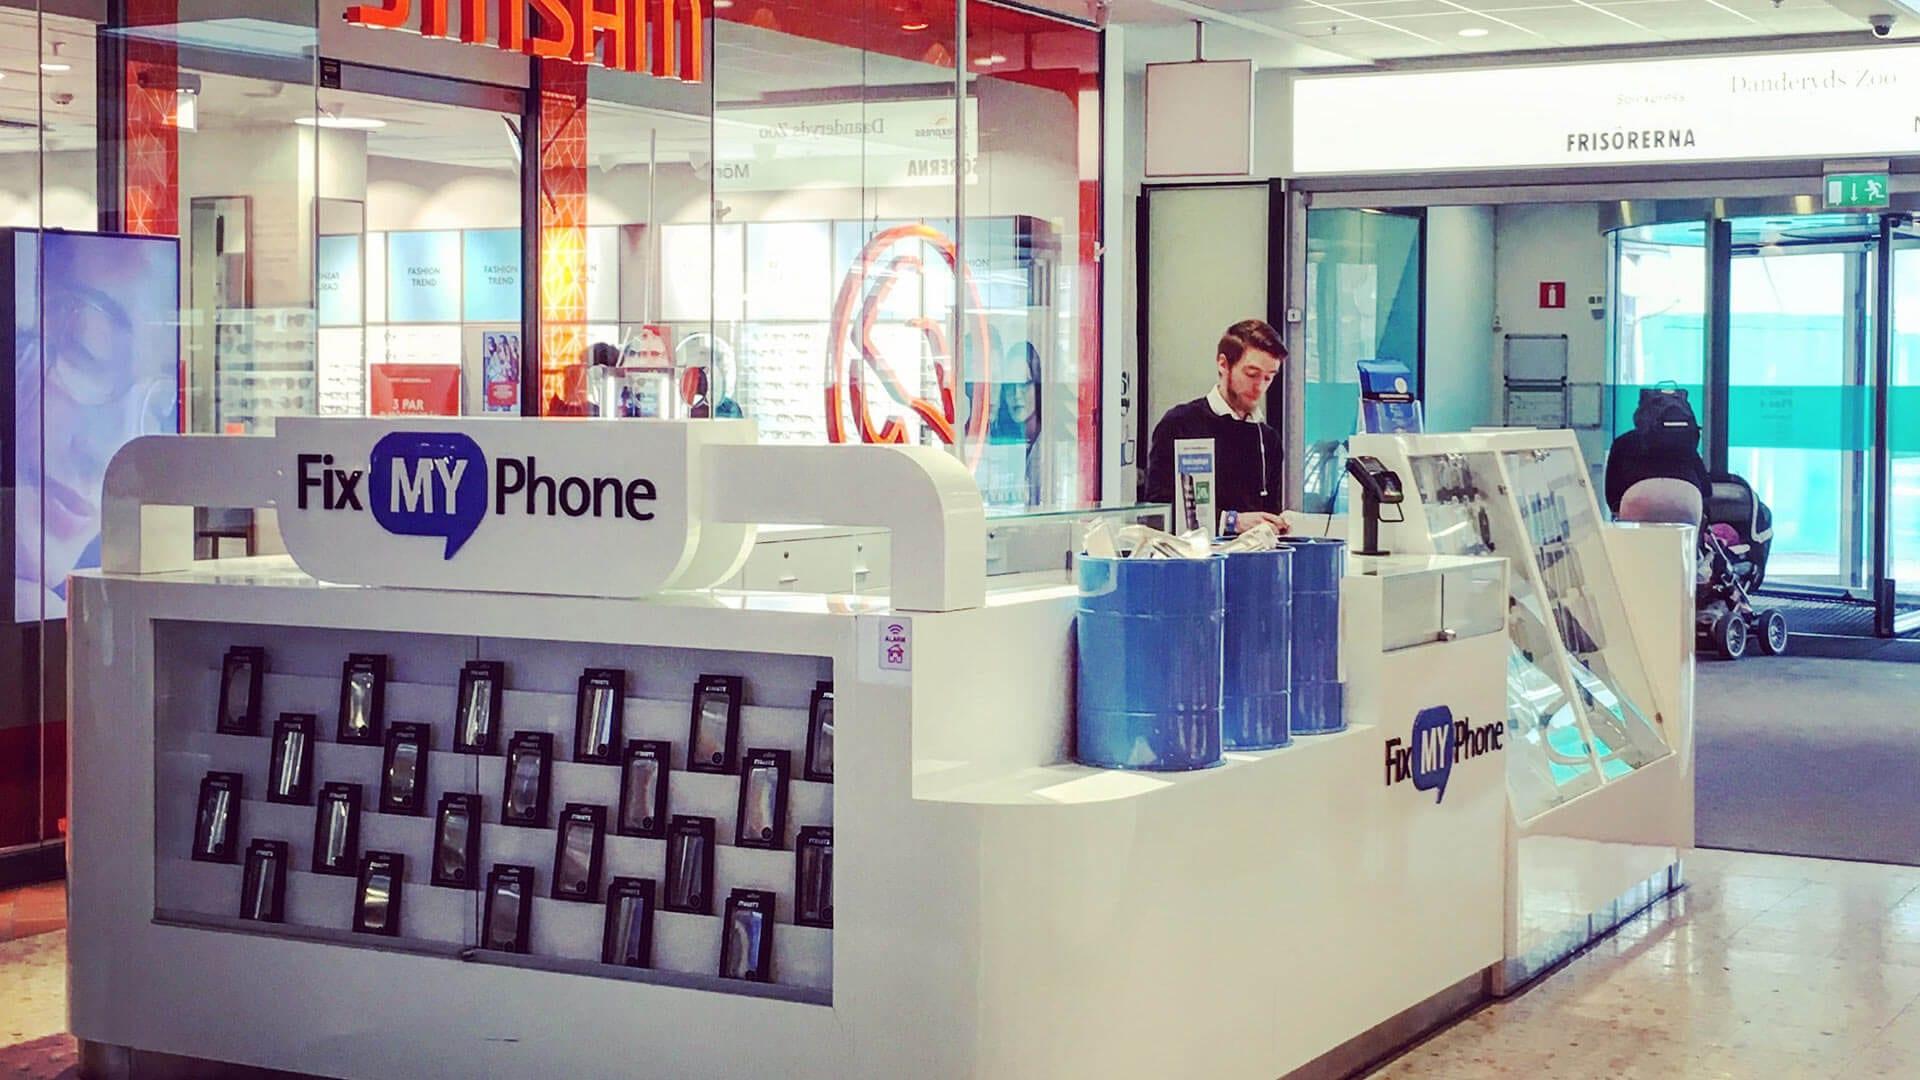 Fix My Phone >> Fix My Phone Morby Centrum